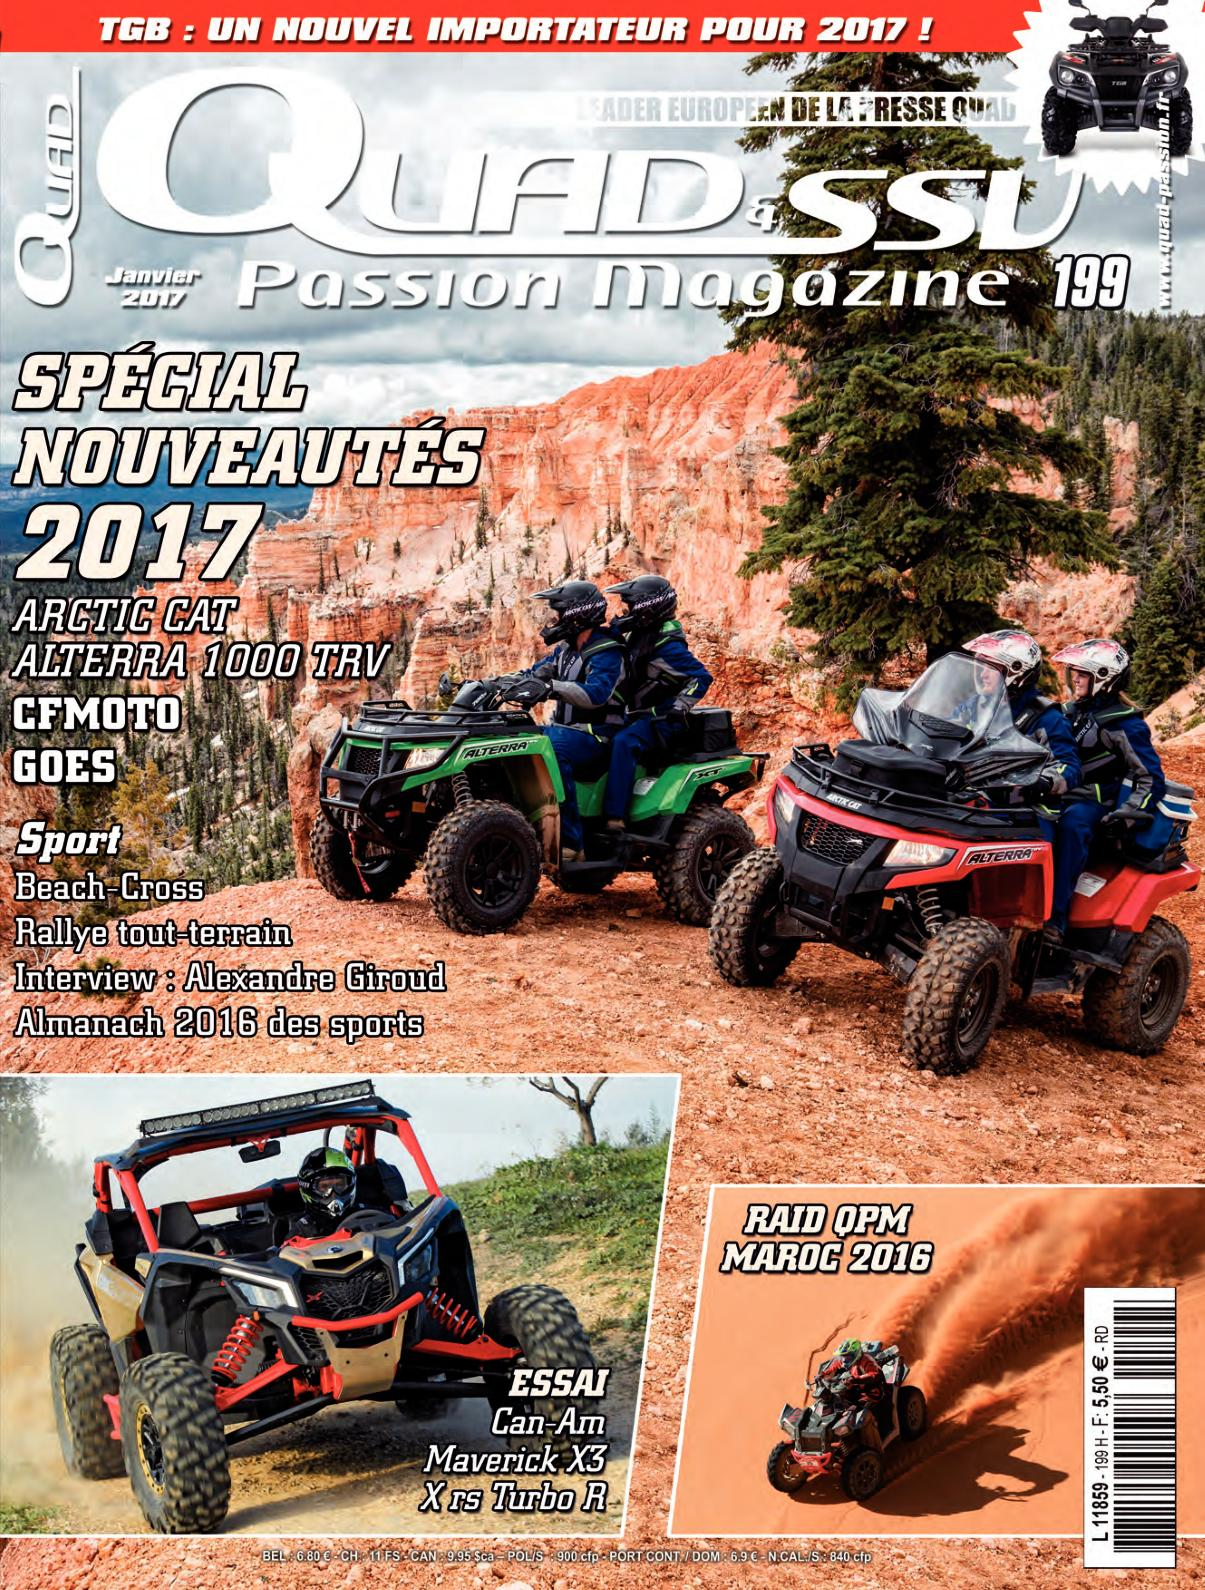 Passion Et Ssv Magazine Quad Calaméo N°199 iPkZOXu